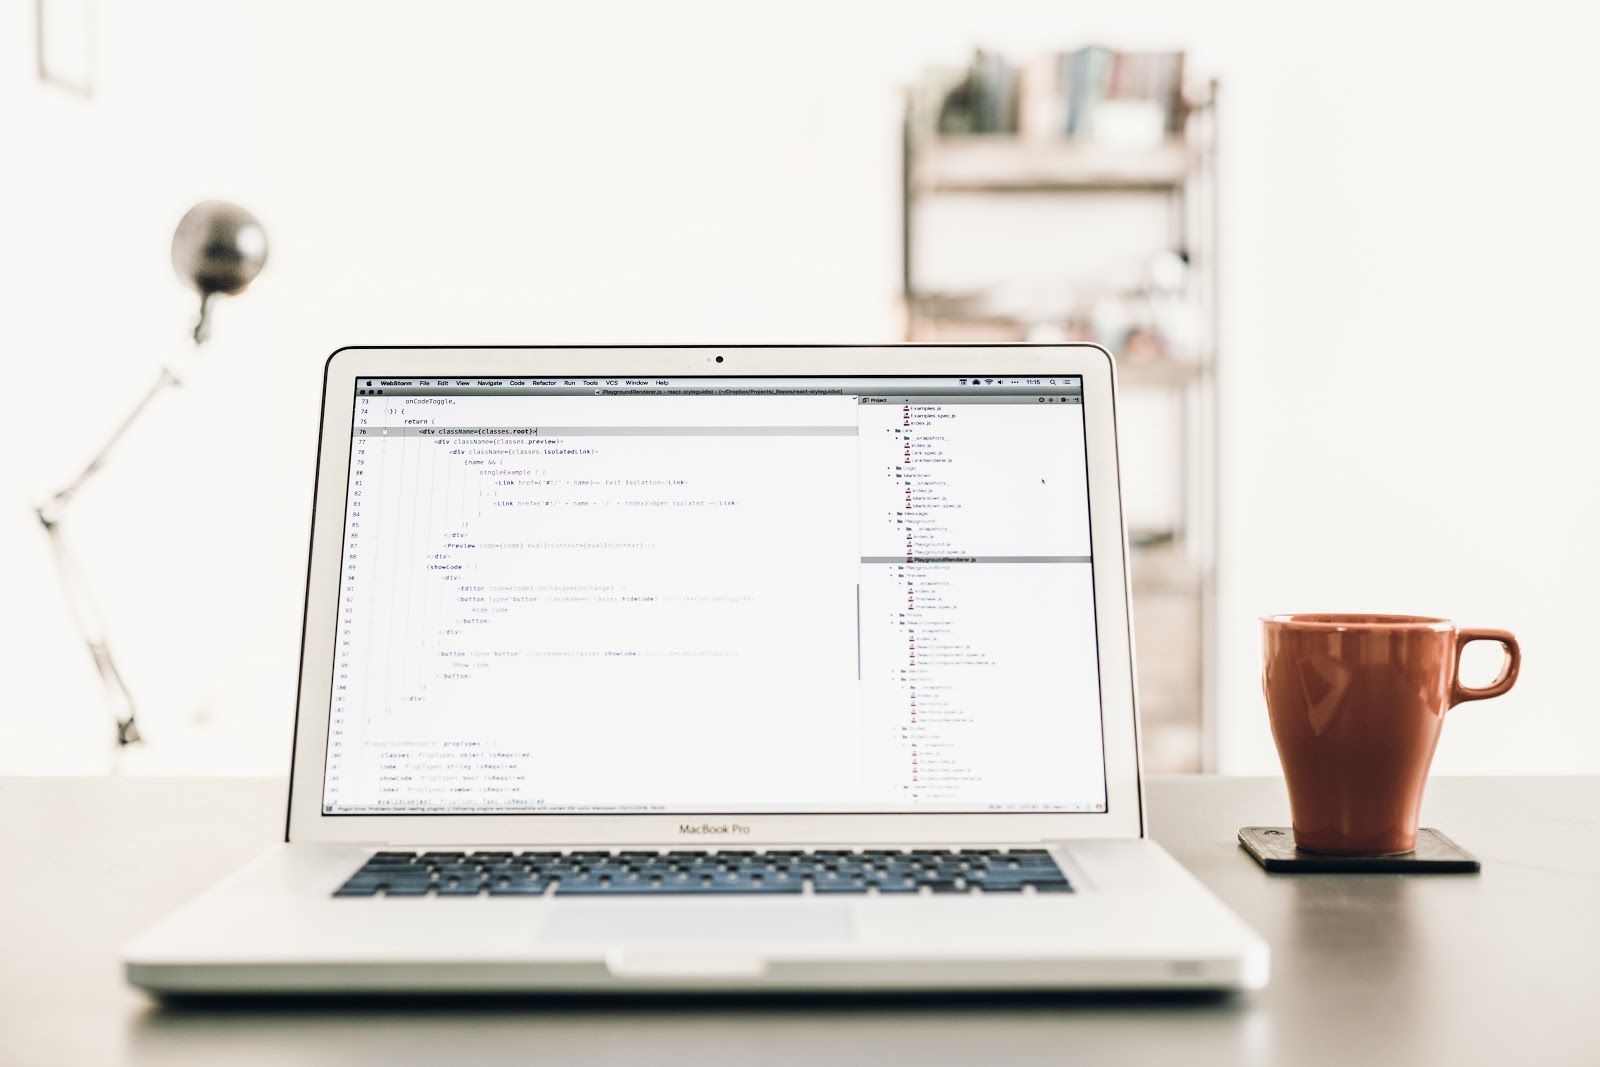 MacBook Pro on a desk with code written on it